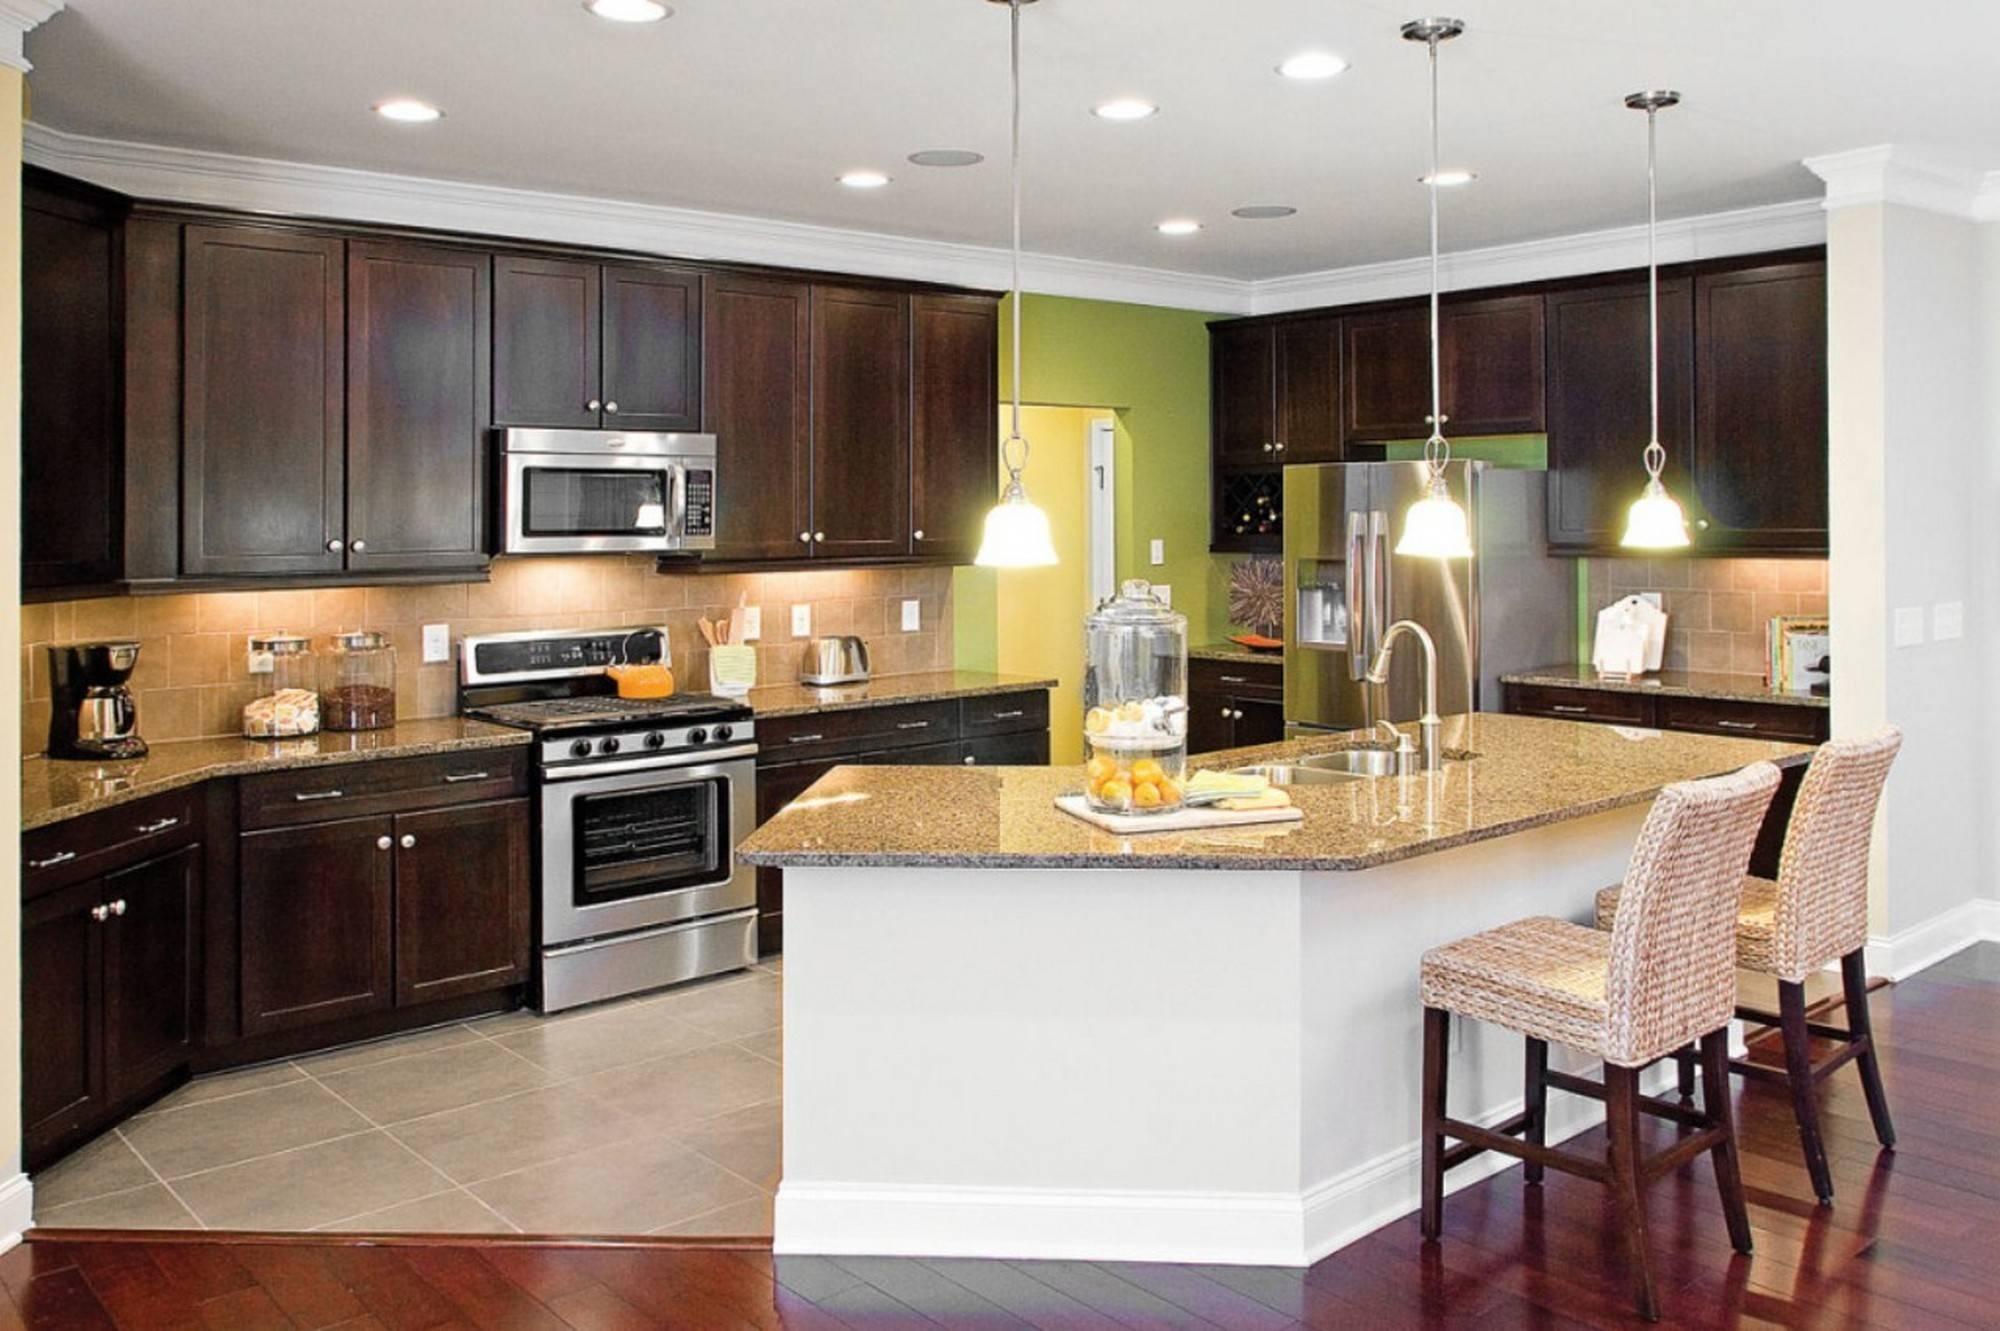 Mini Pendant Lights For Kitchen #8169 | Baytownkitchen with Mini Pendants for Kitchen Island (Image 9 of 15)